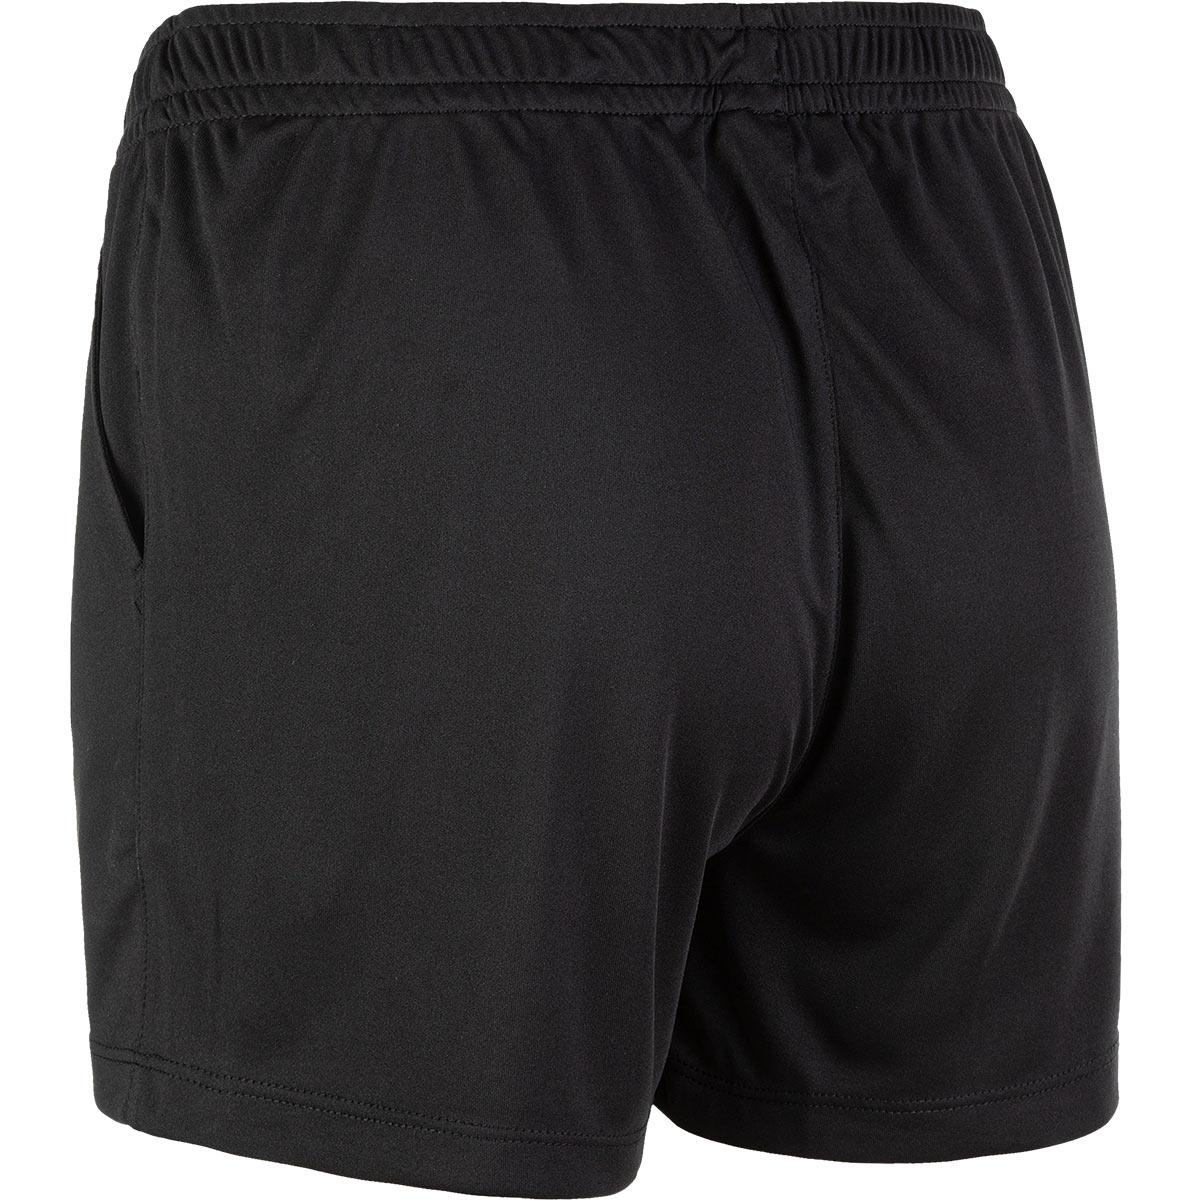 FZ Layla shorts